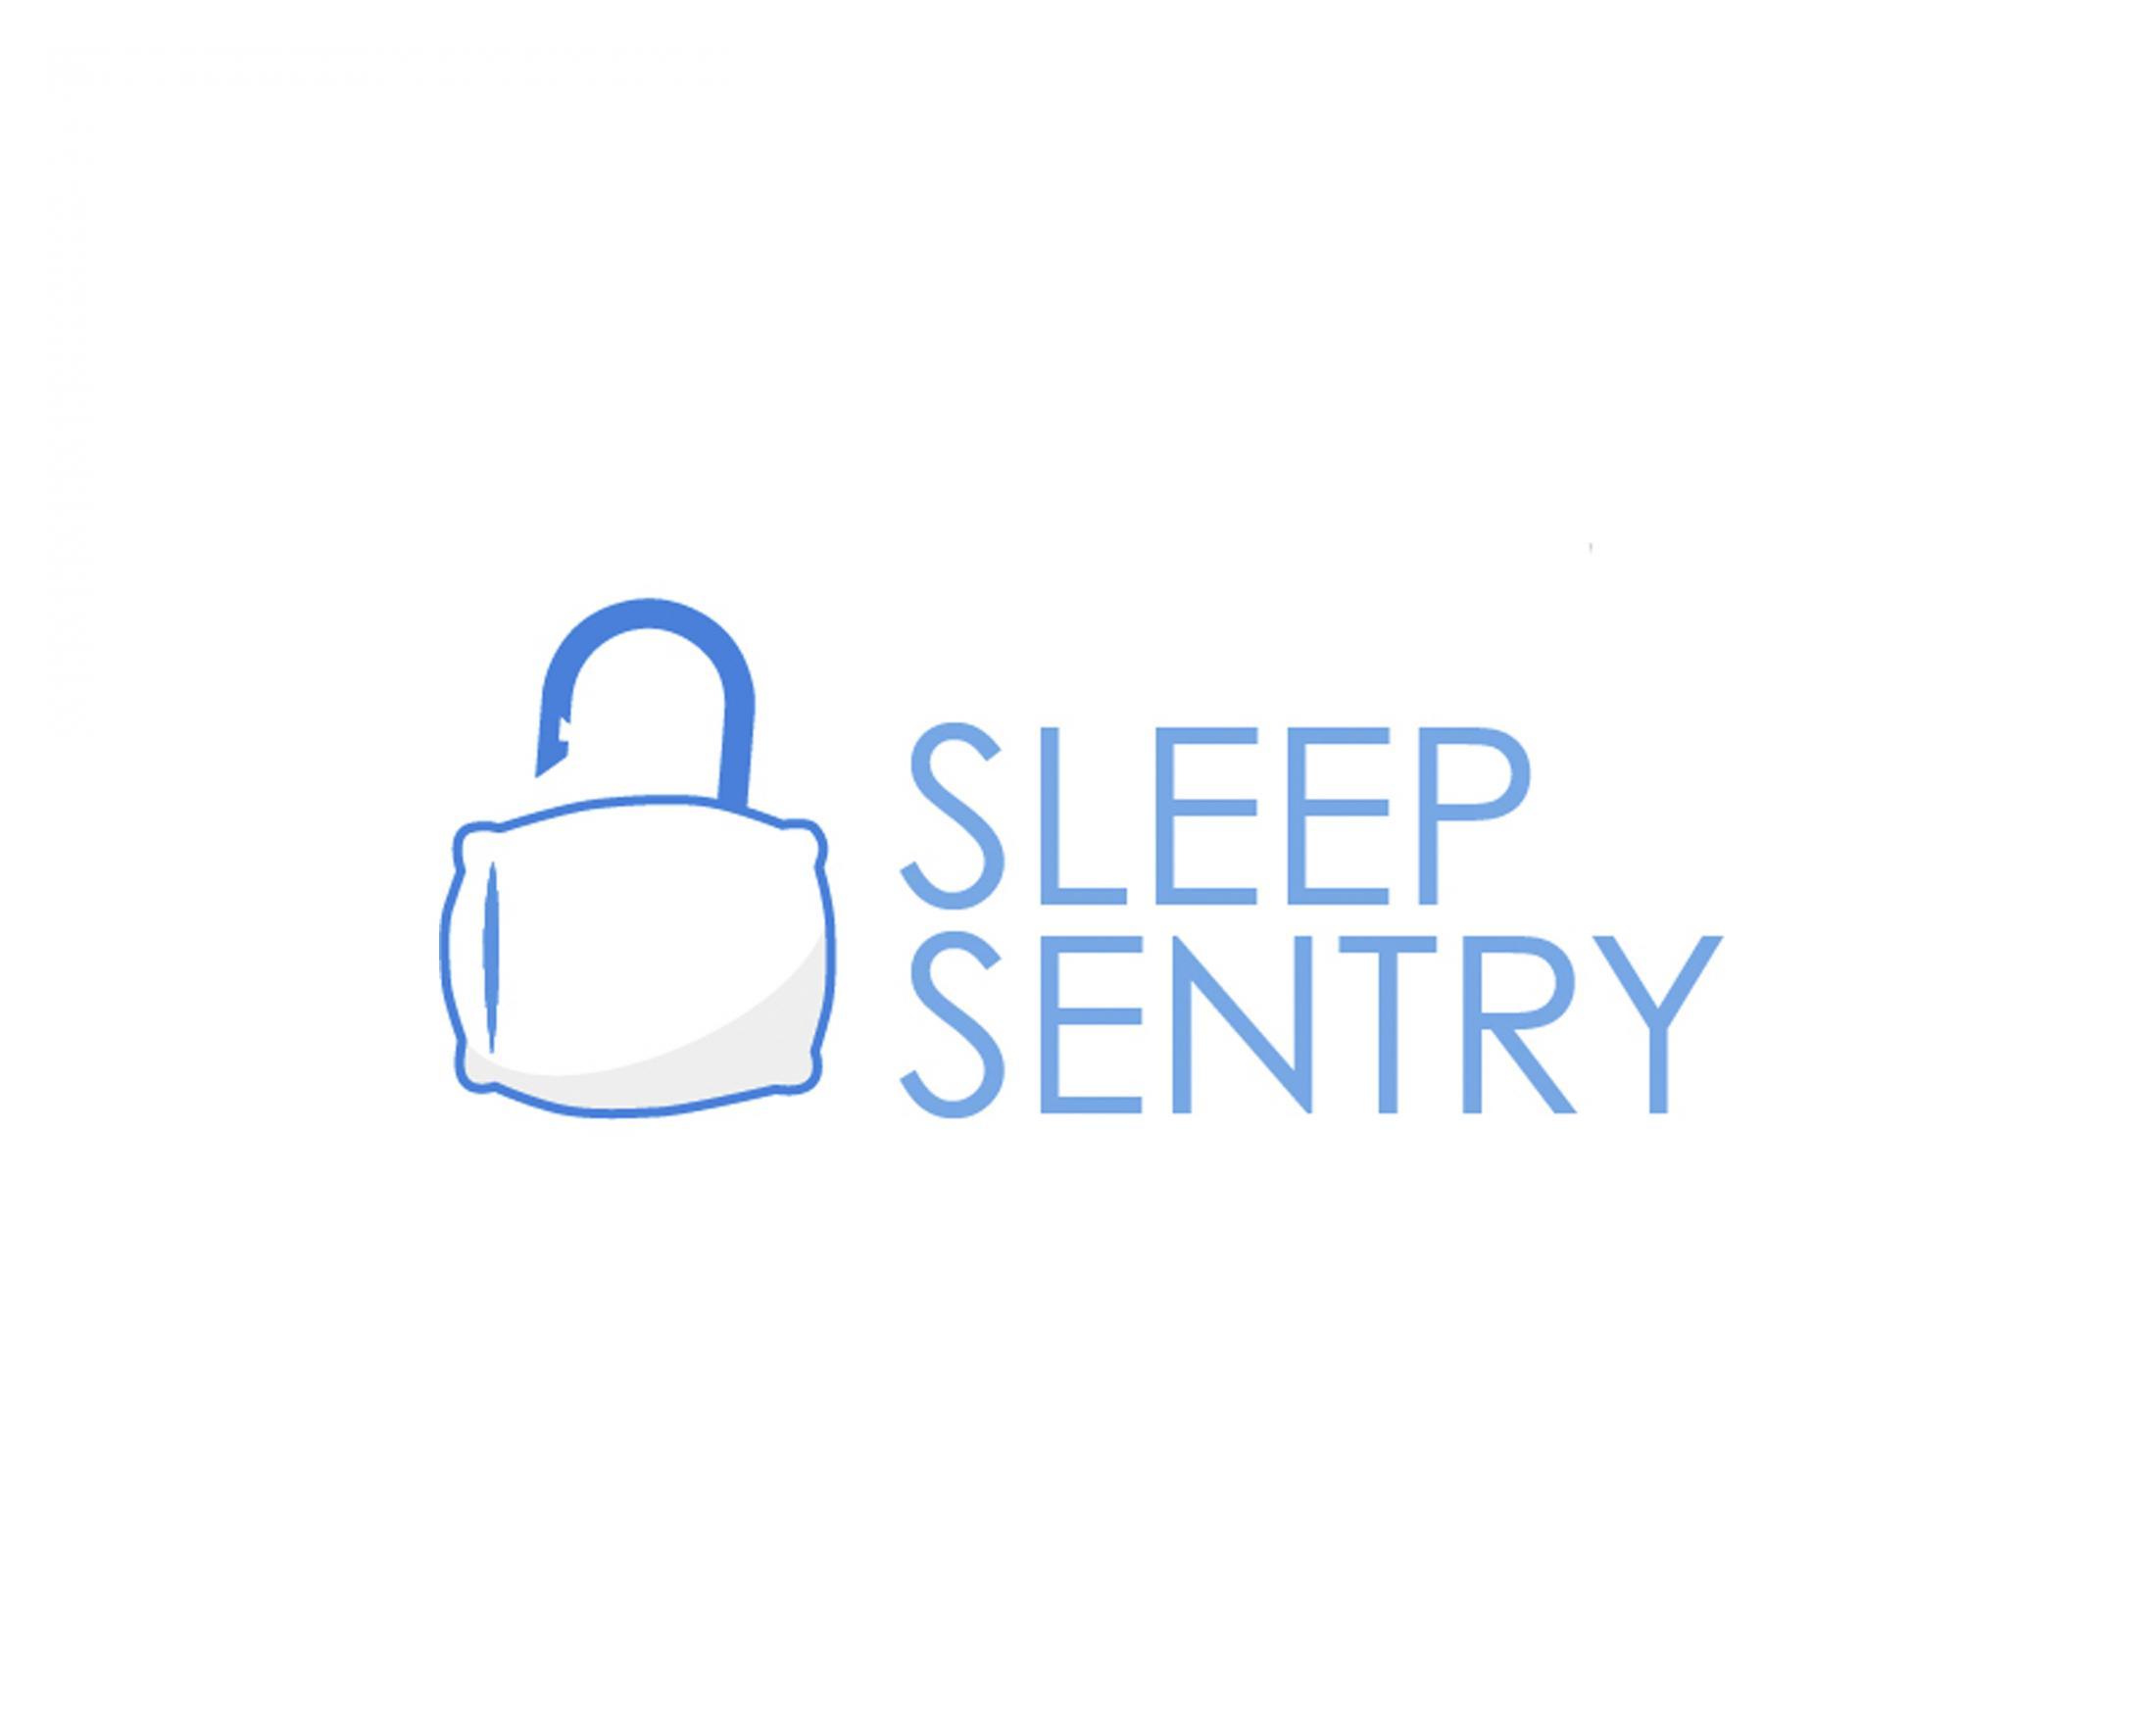 Thumbnail for Sleep Sentry